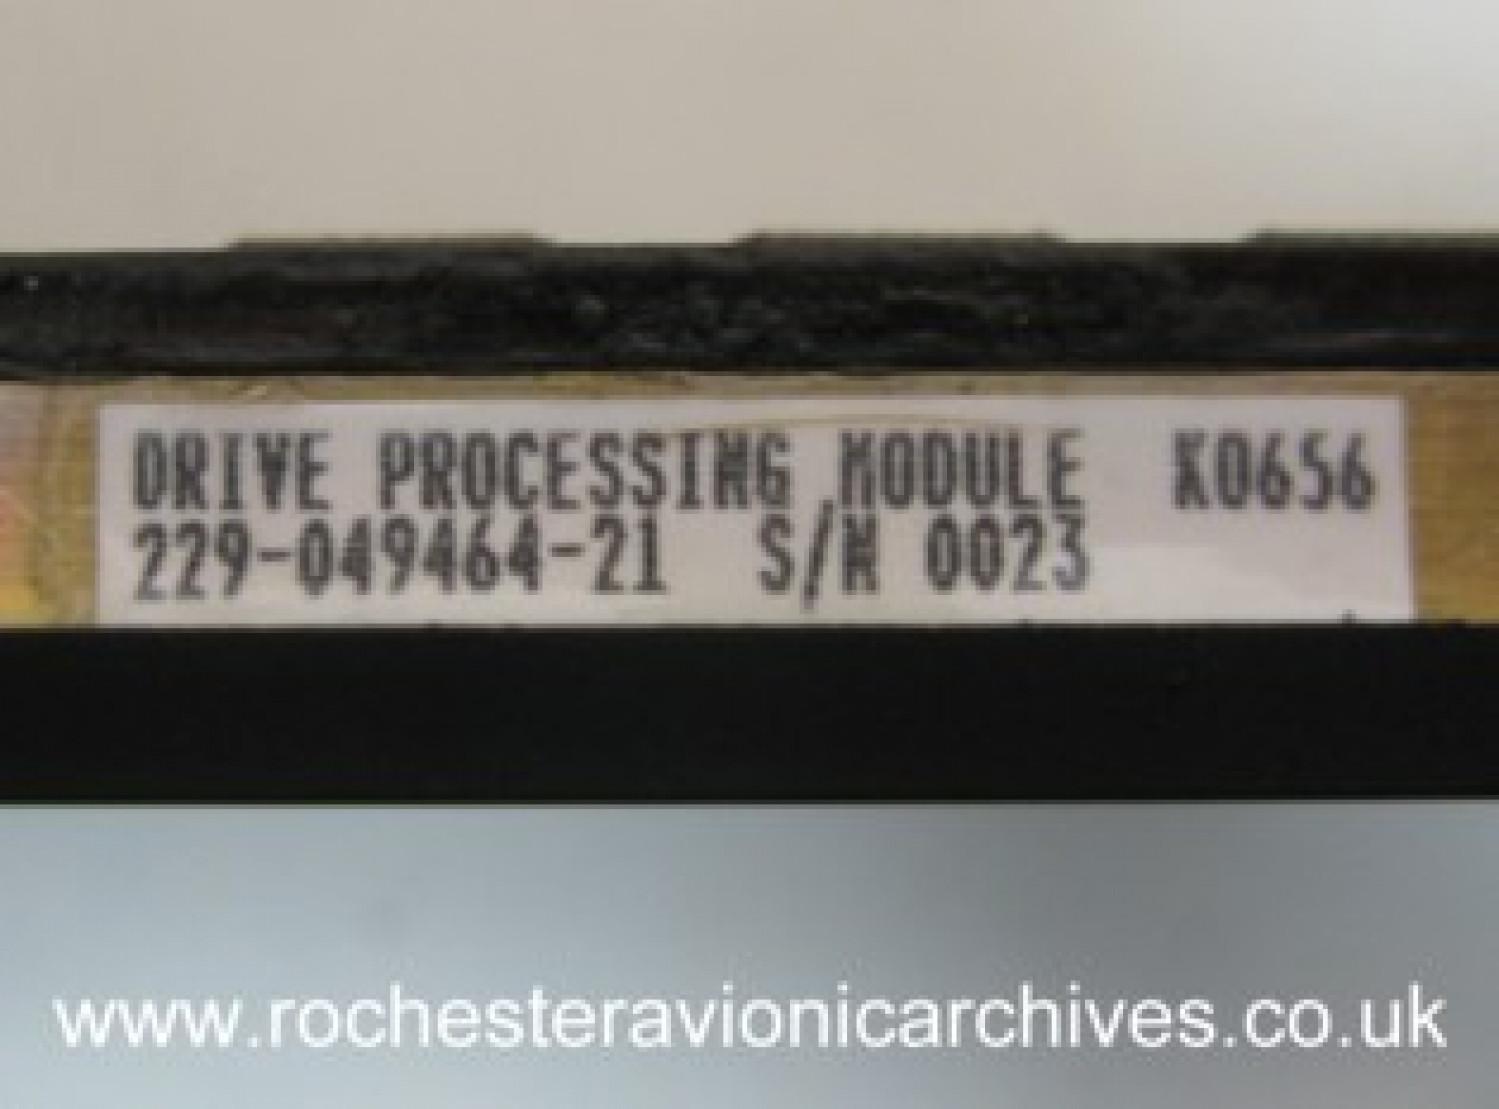 Drive Processing Module